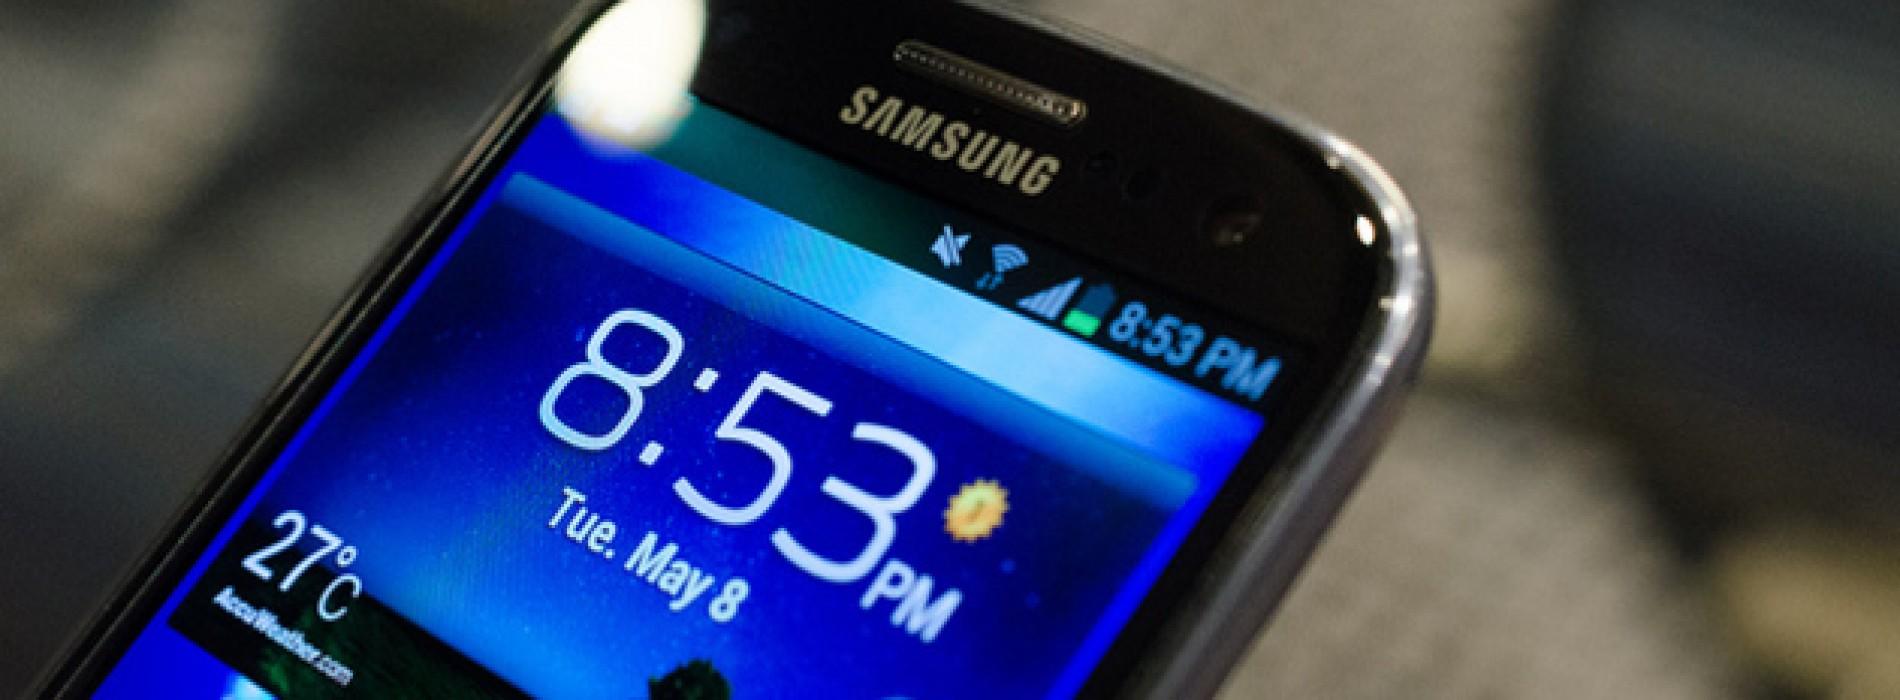 Verizon says Galaxy SIII bootloader will be unlocked via OTA update [UPDATED: FALSE]